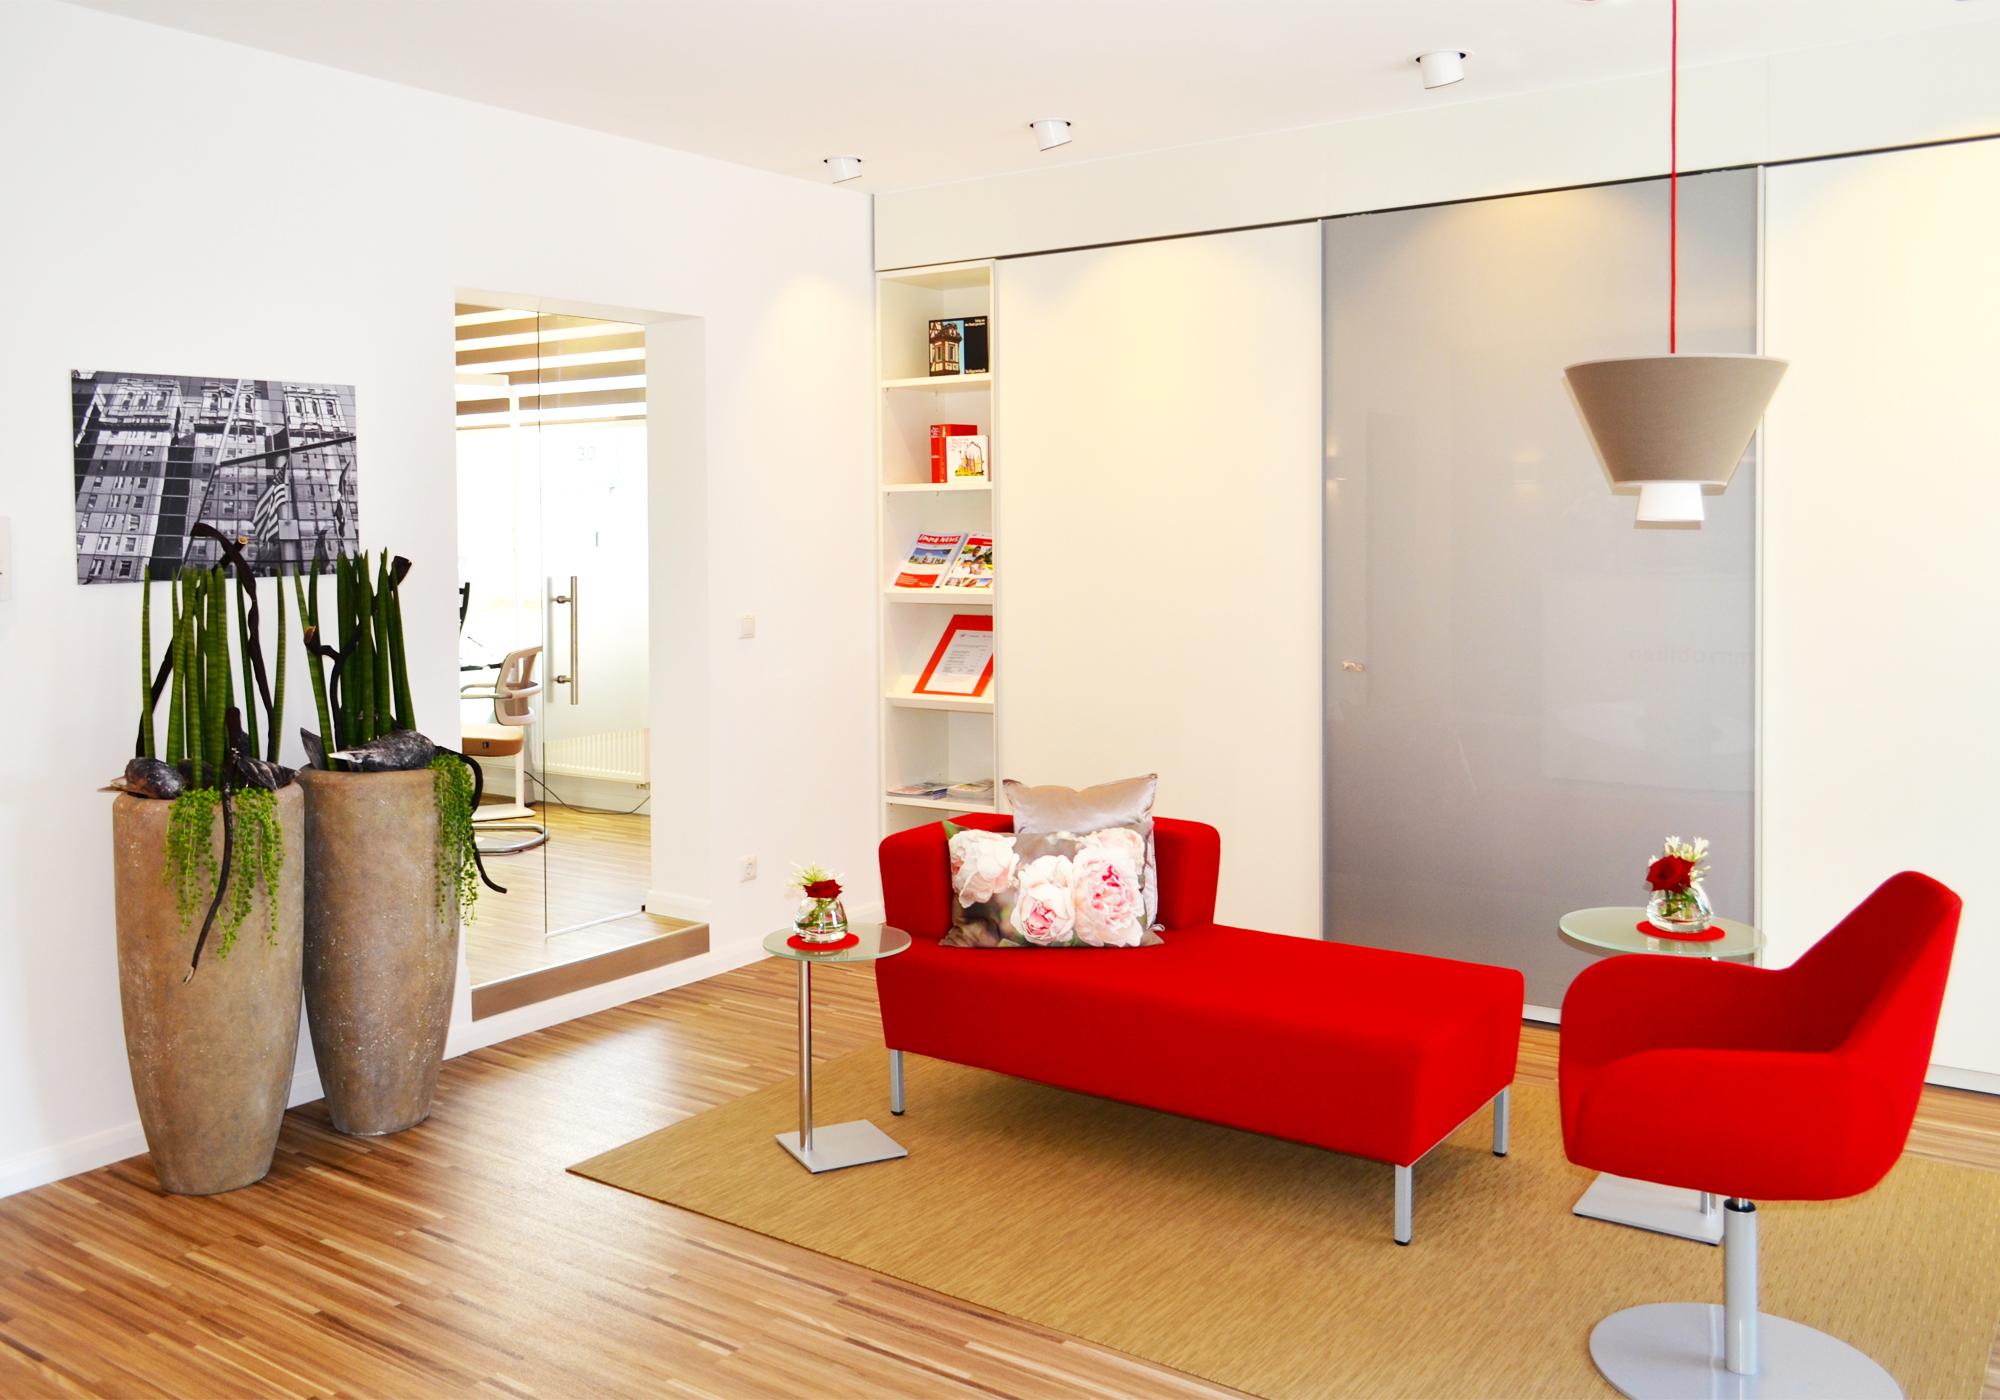 business dekoart home staging room stylingdekoart home staging room styling. Black Bedroom Furniture Sets. Home Design Ideas